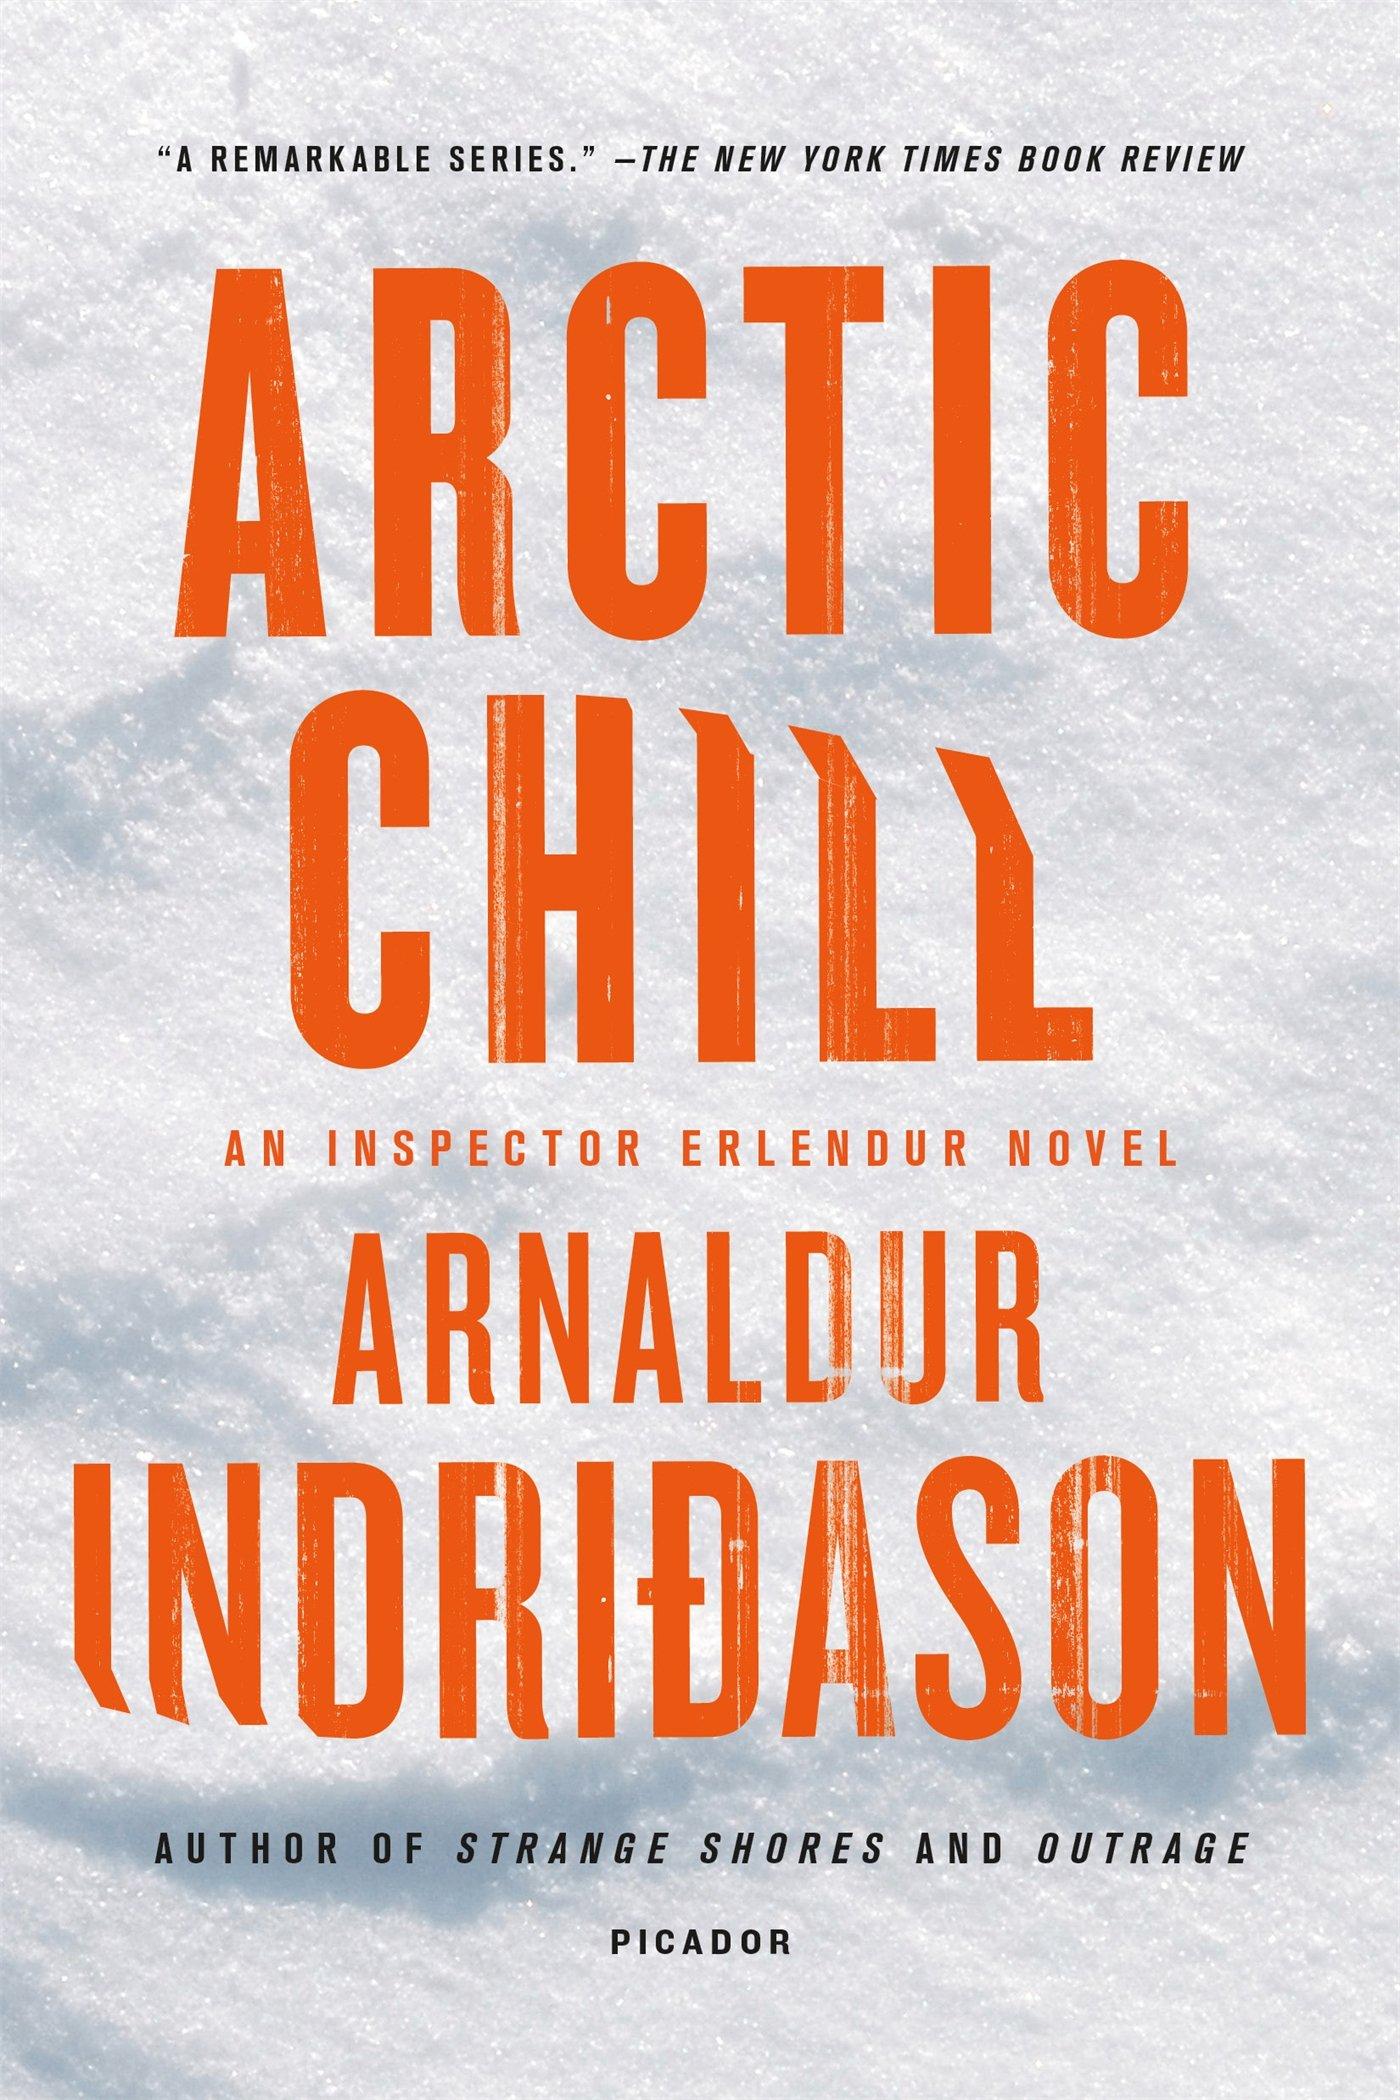 Arctic Chill Inspector Erlendur Novel product image